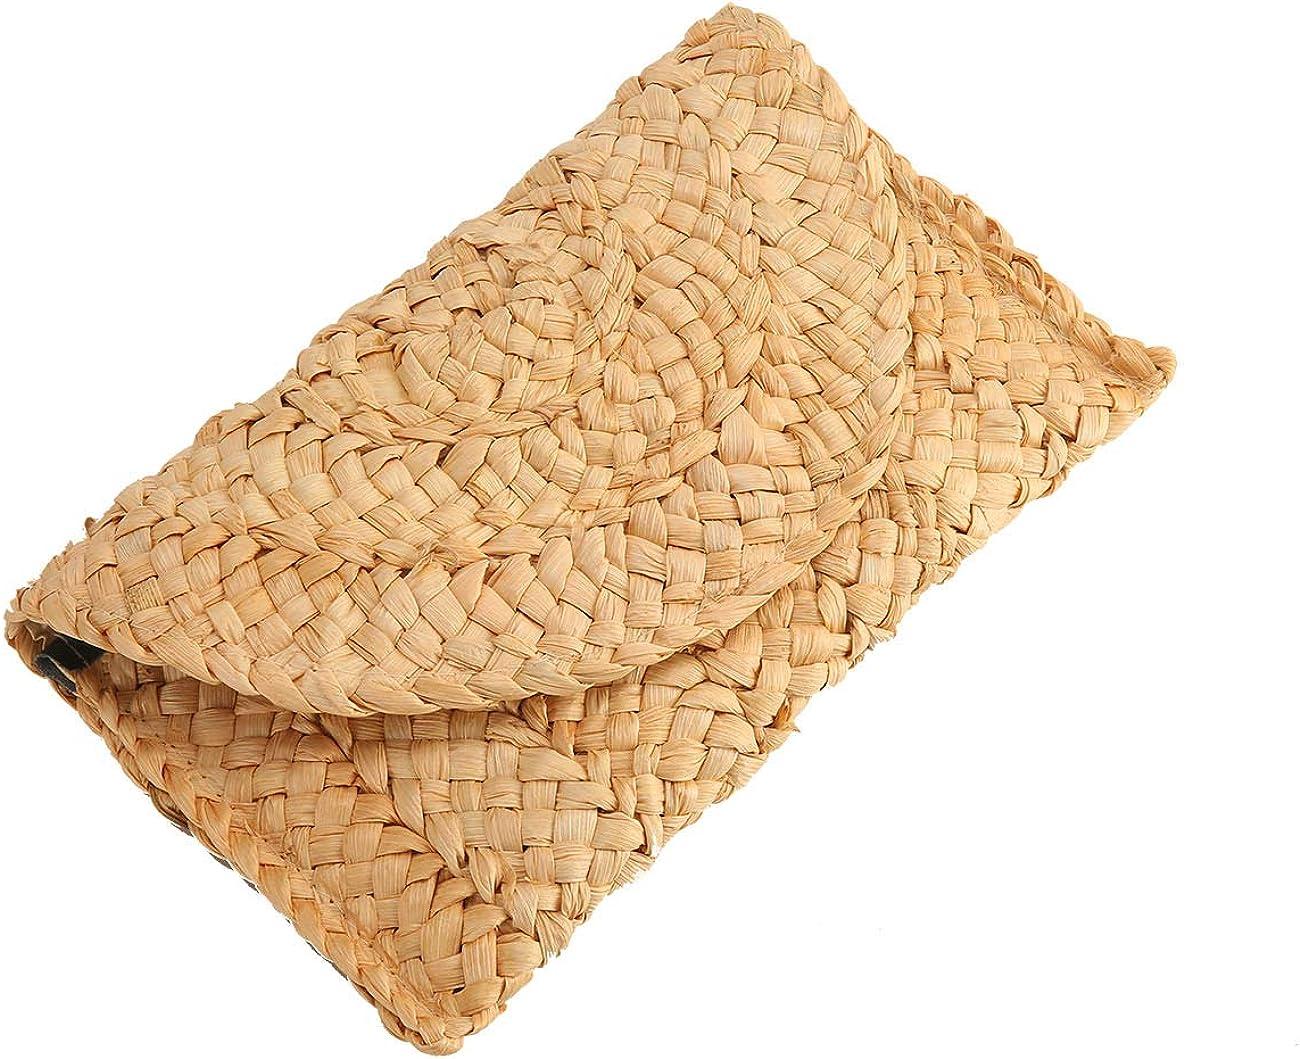 safety Straw Clutch Handbag Alilove Women Purse Envelope Wal Over item handling Bag